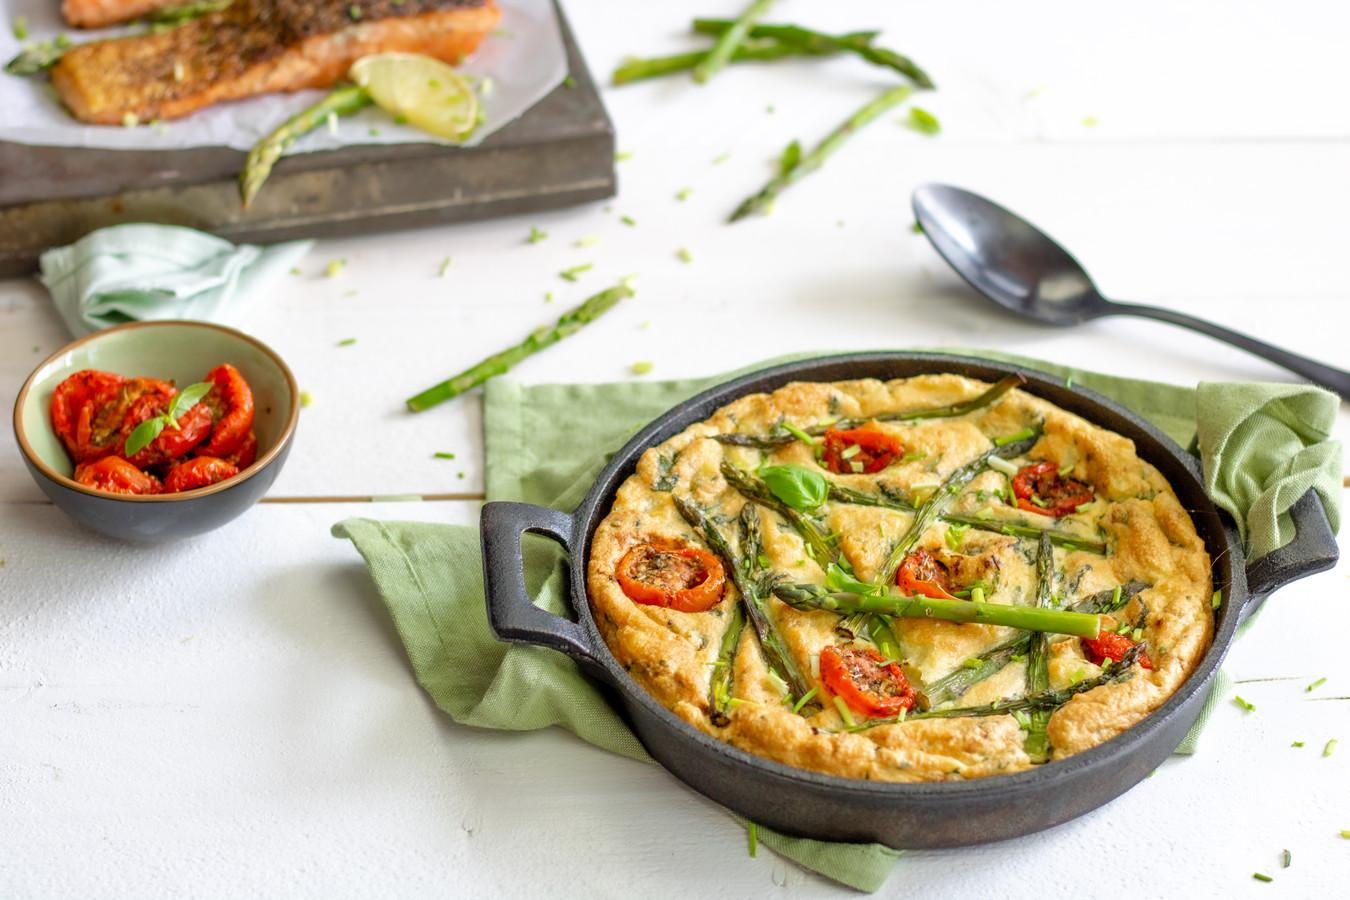 Aardappelsoufflé met asperges, Parmezaanse kaas en zalm